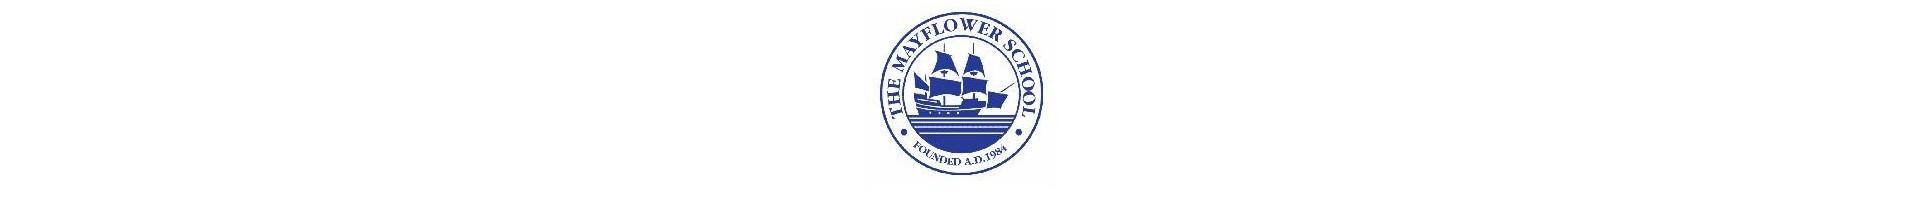 The Mayflower School